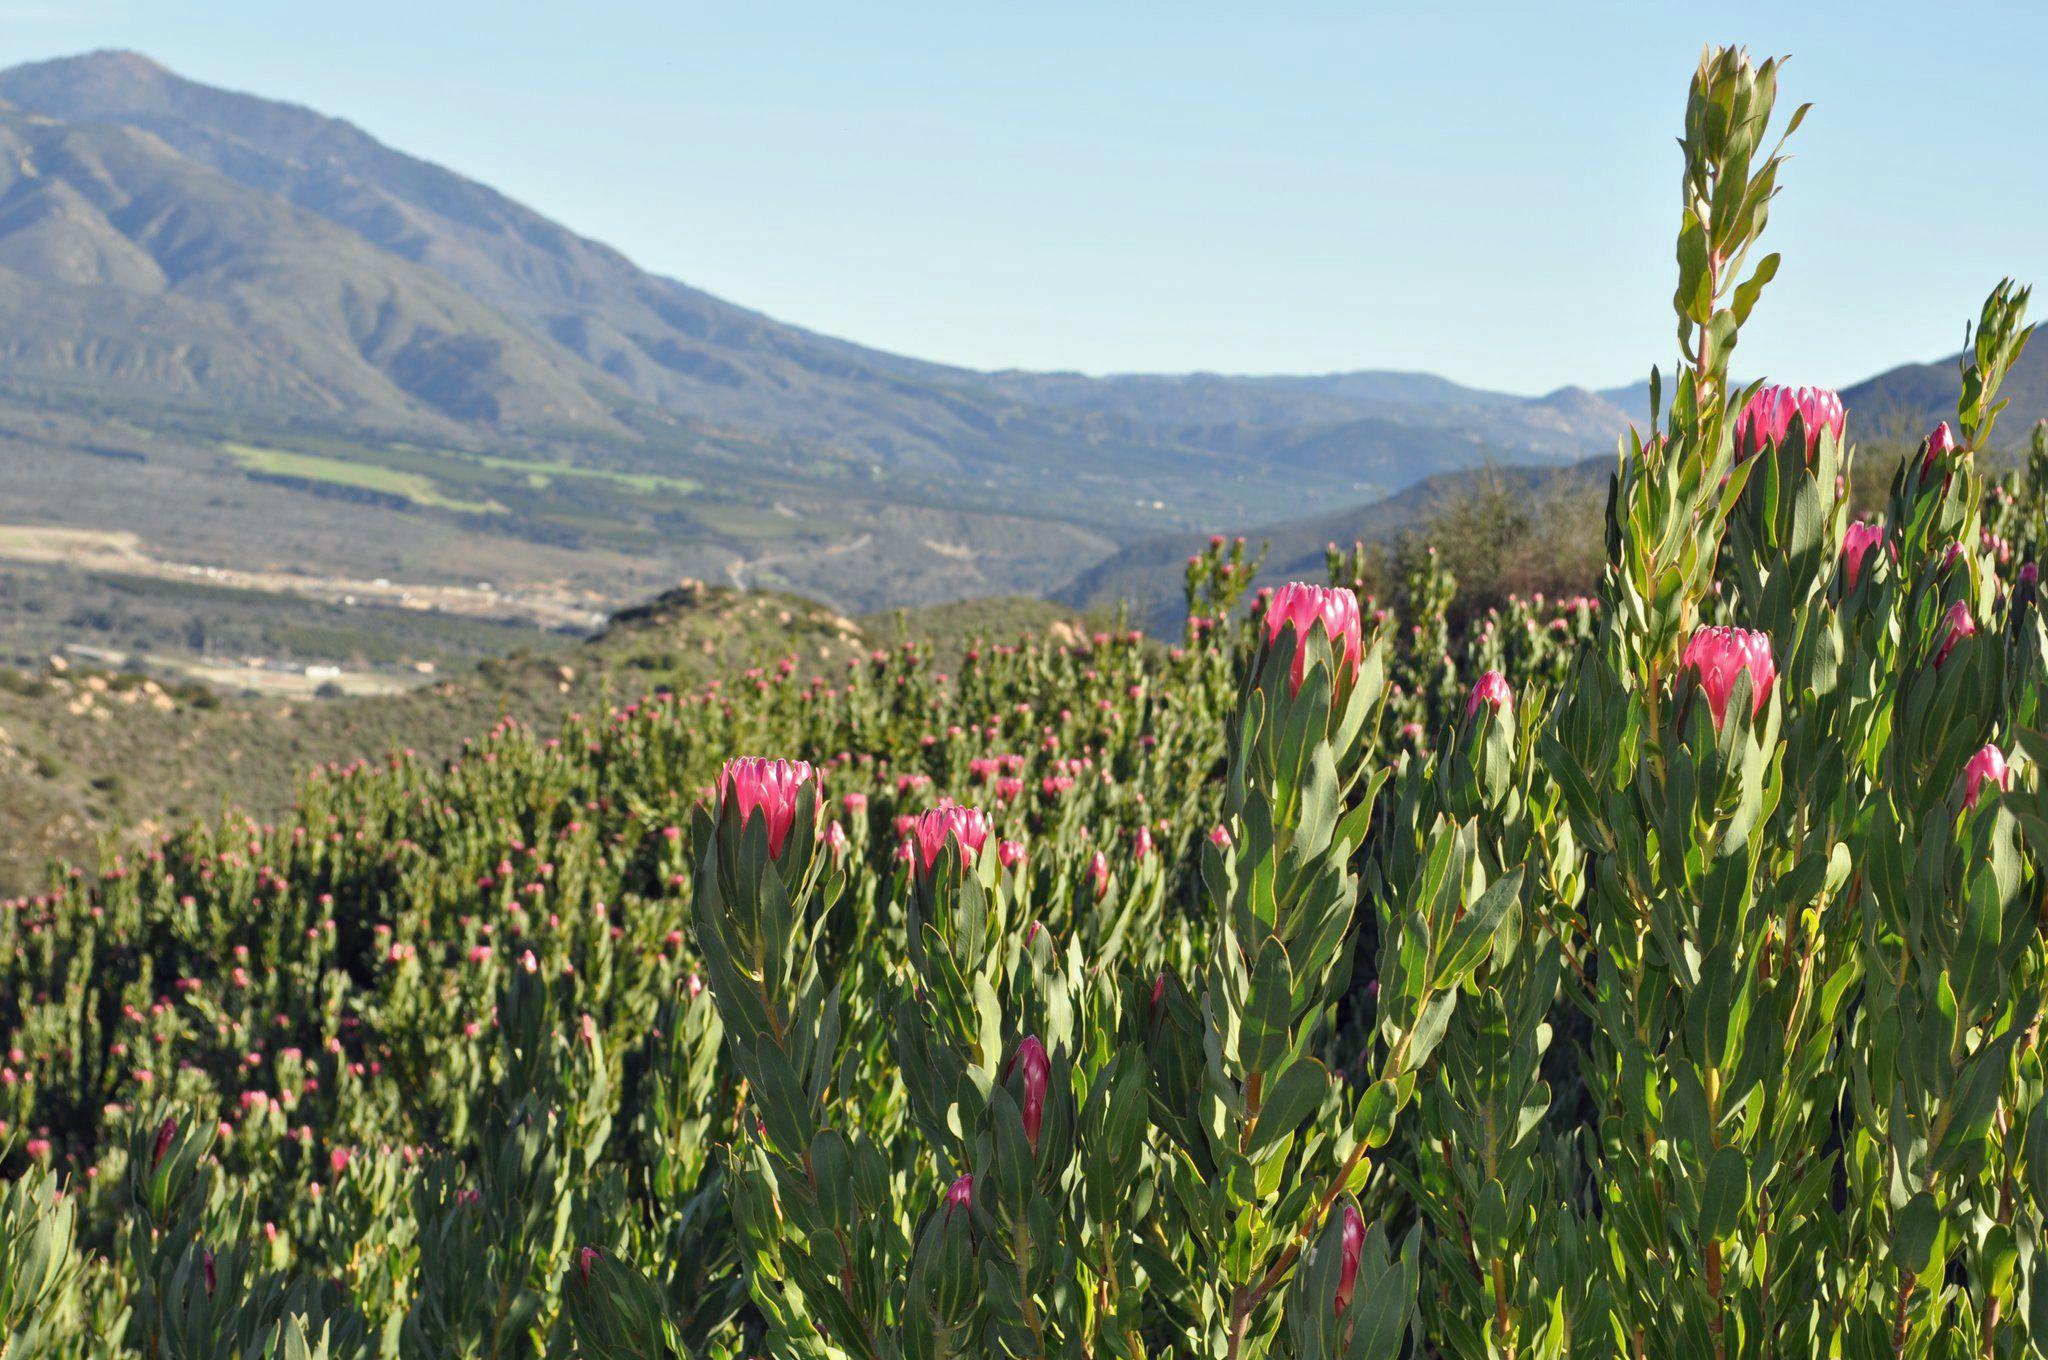 Protea Andrea Field Cagrown Protea Resendizbrothers Com Protea Plant Trees To Plant Protea Flower